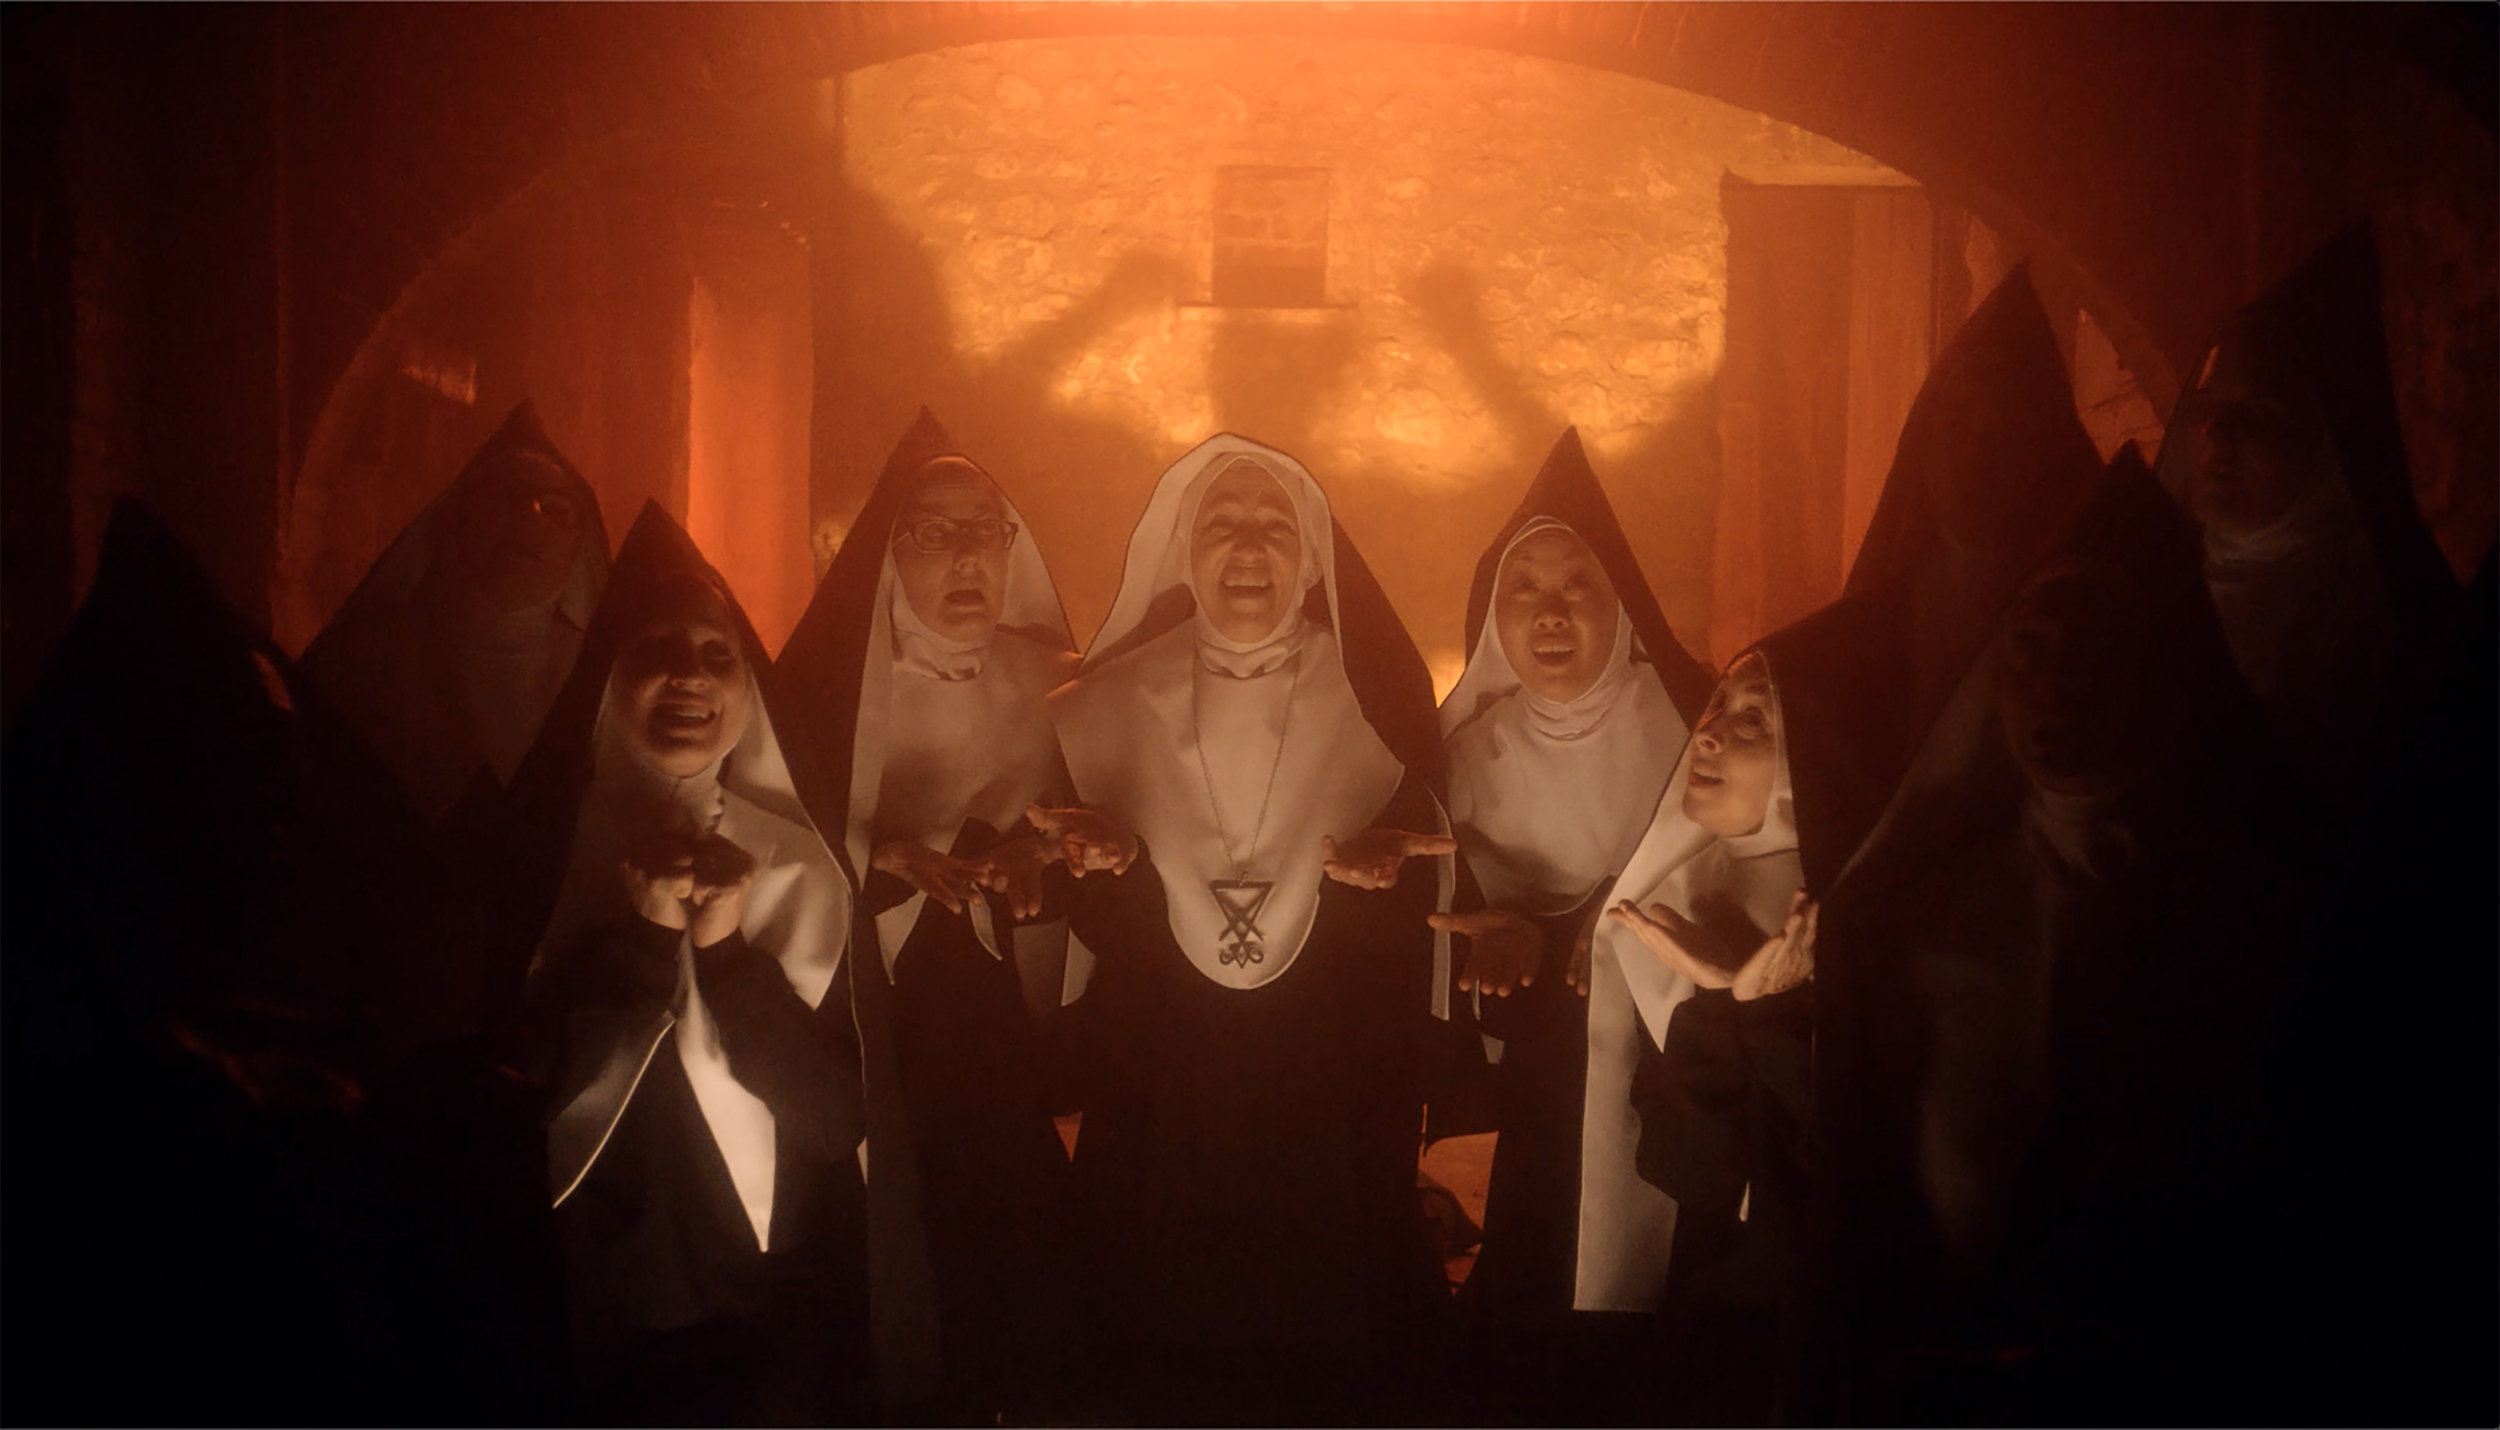 5 Good omens chattering nuns hal kirkland.jpg